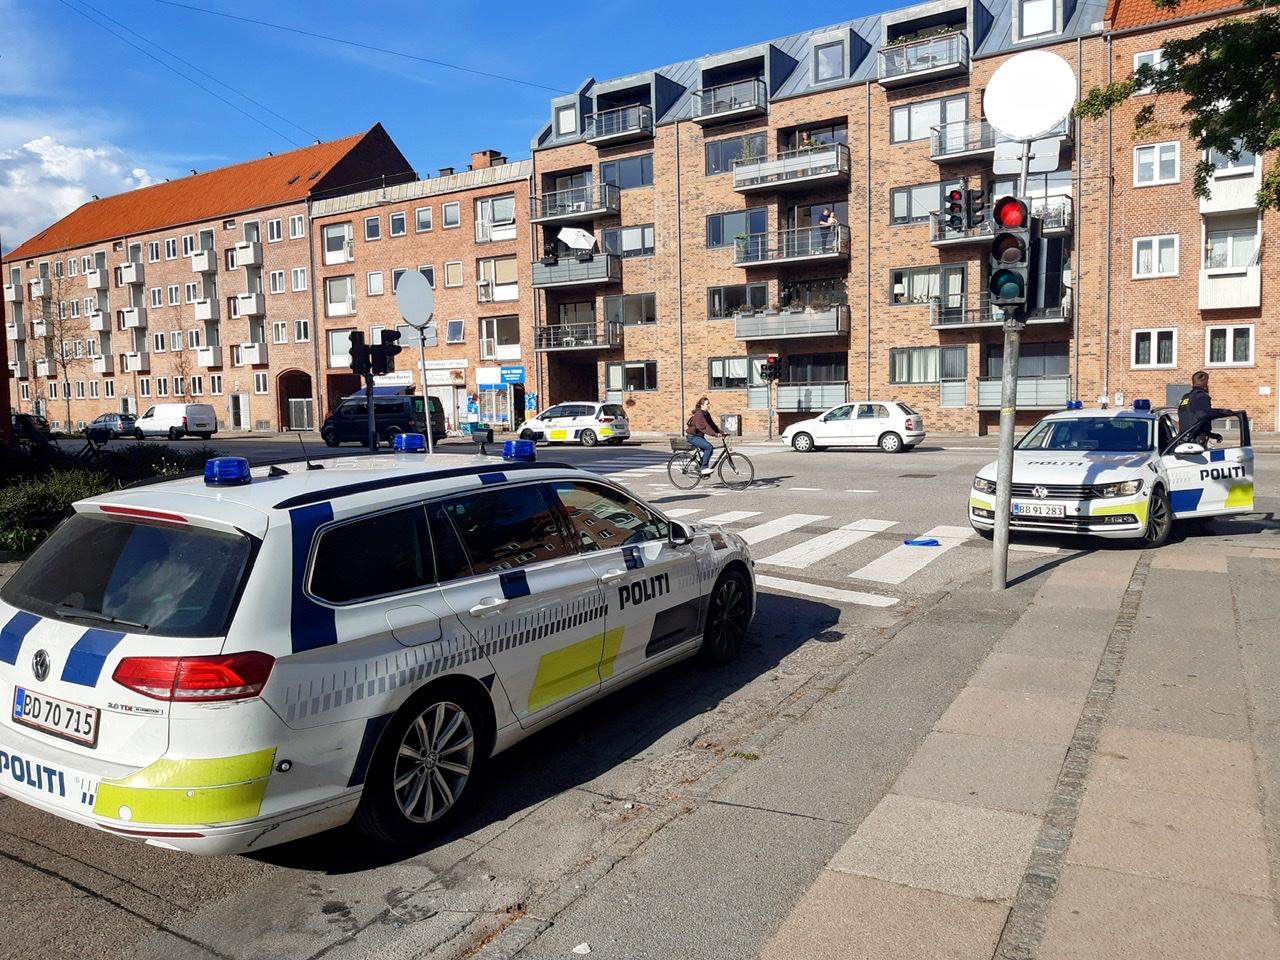 Ældre mand truet med kniv - politiet jagter gerningsmand